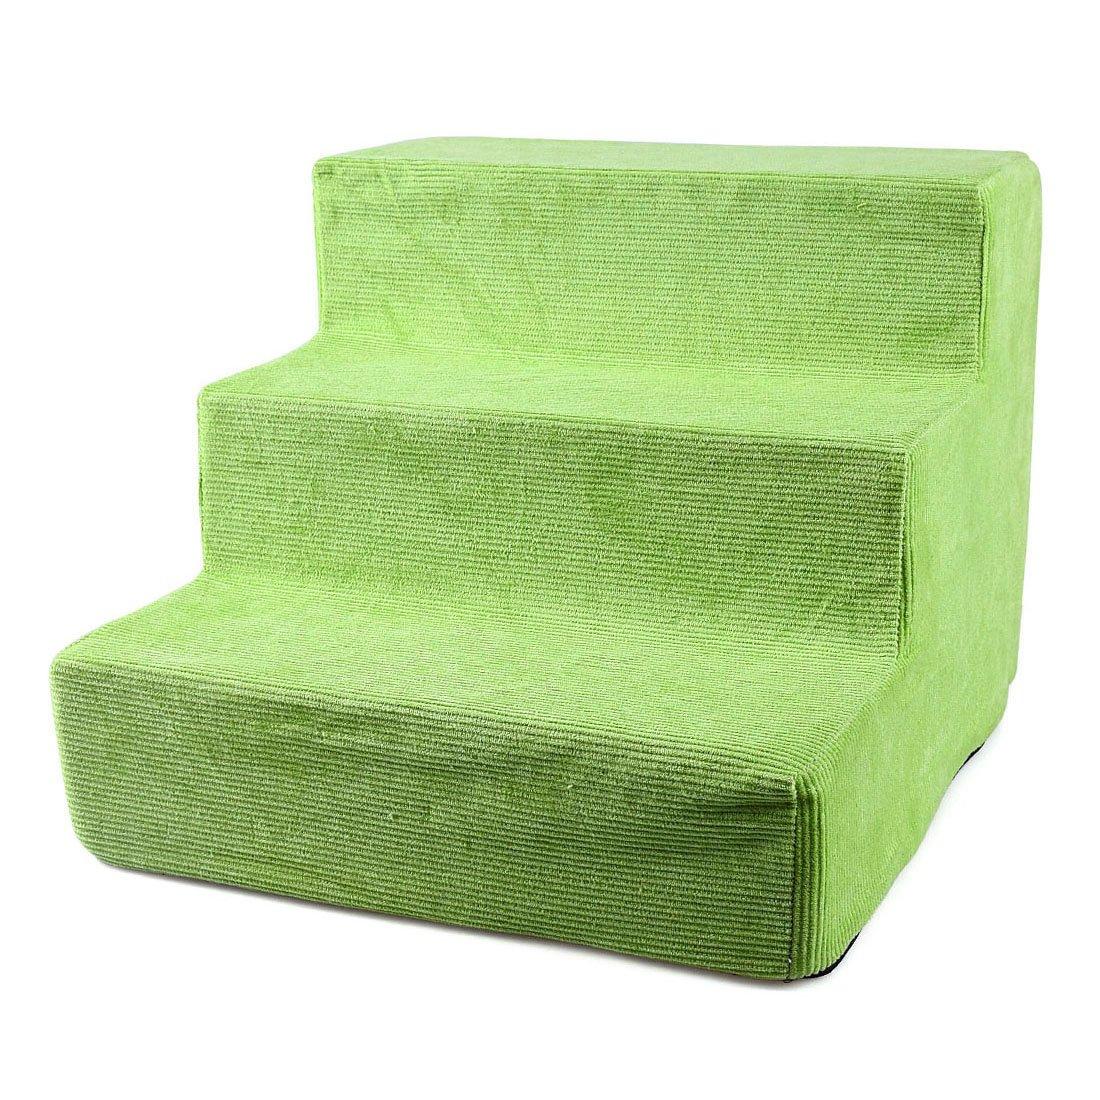 Green Freahap Pet Stair for Small Dog Cat Puppy Kitten Nonslip Dog Stair High Density Foam Green